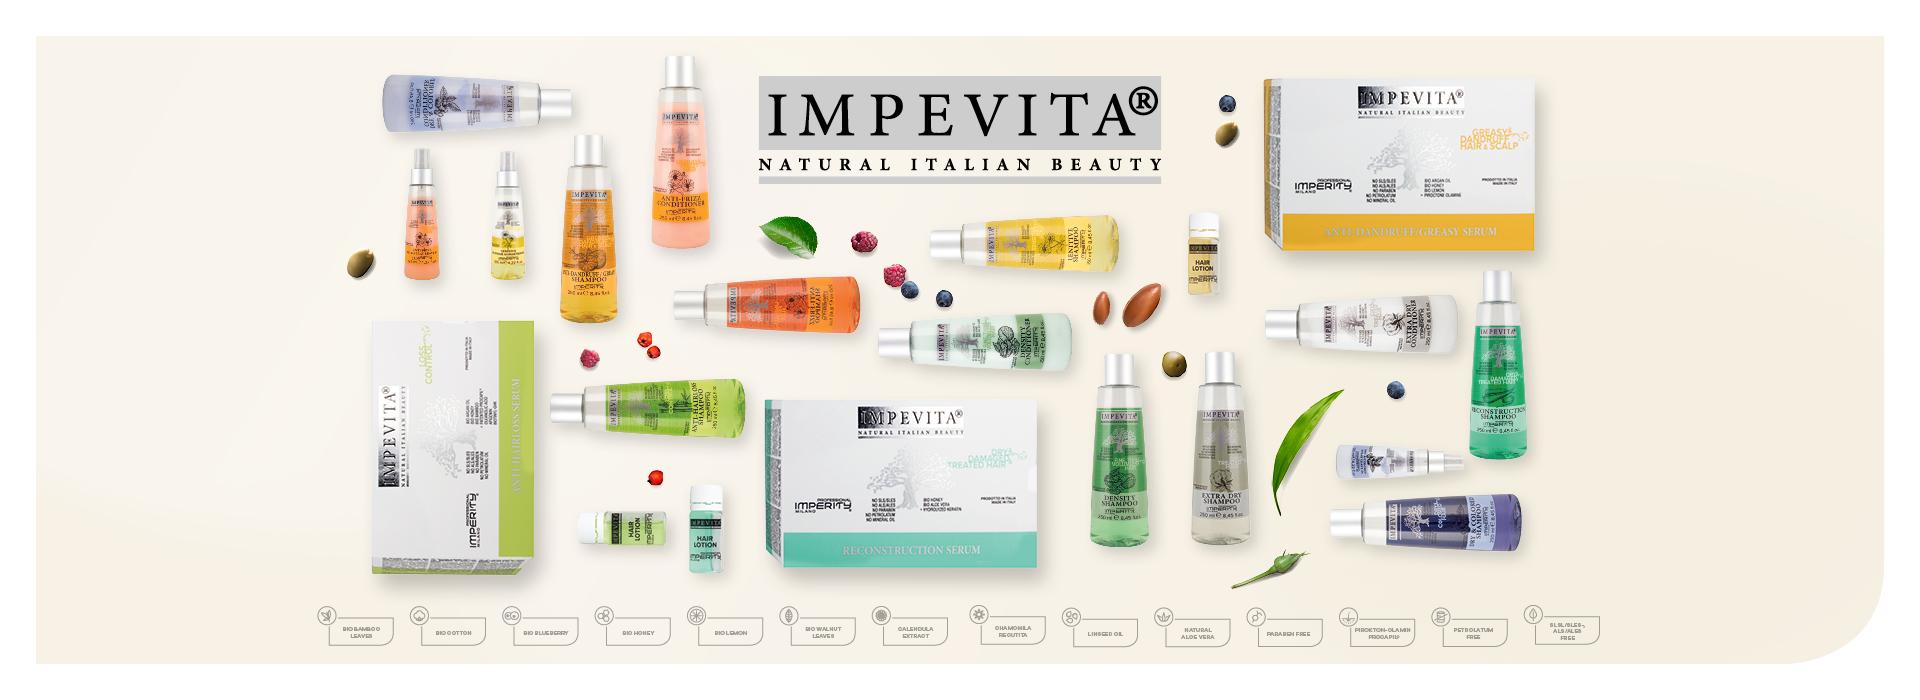 Impevita Natural Italian Beauty